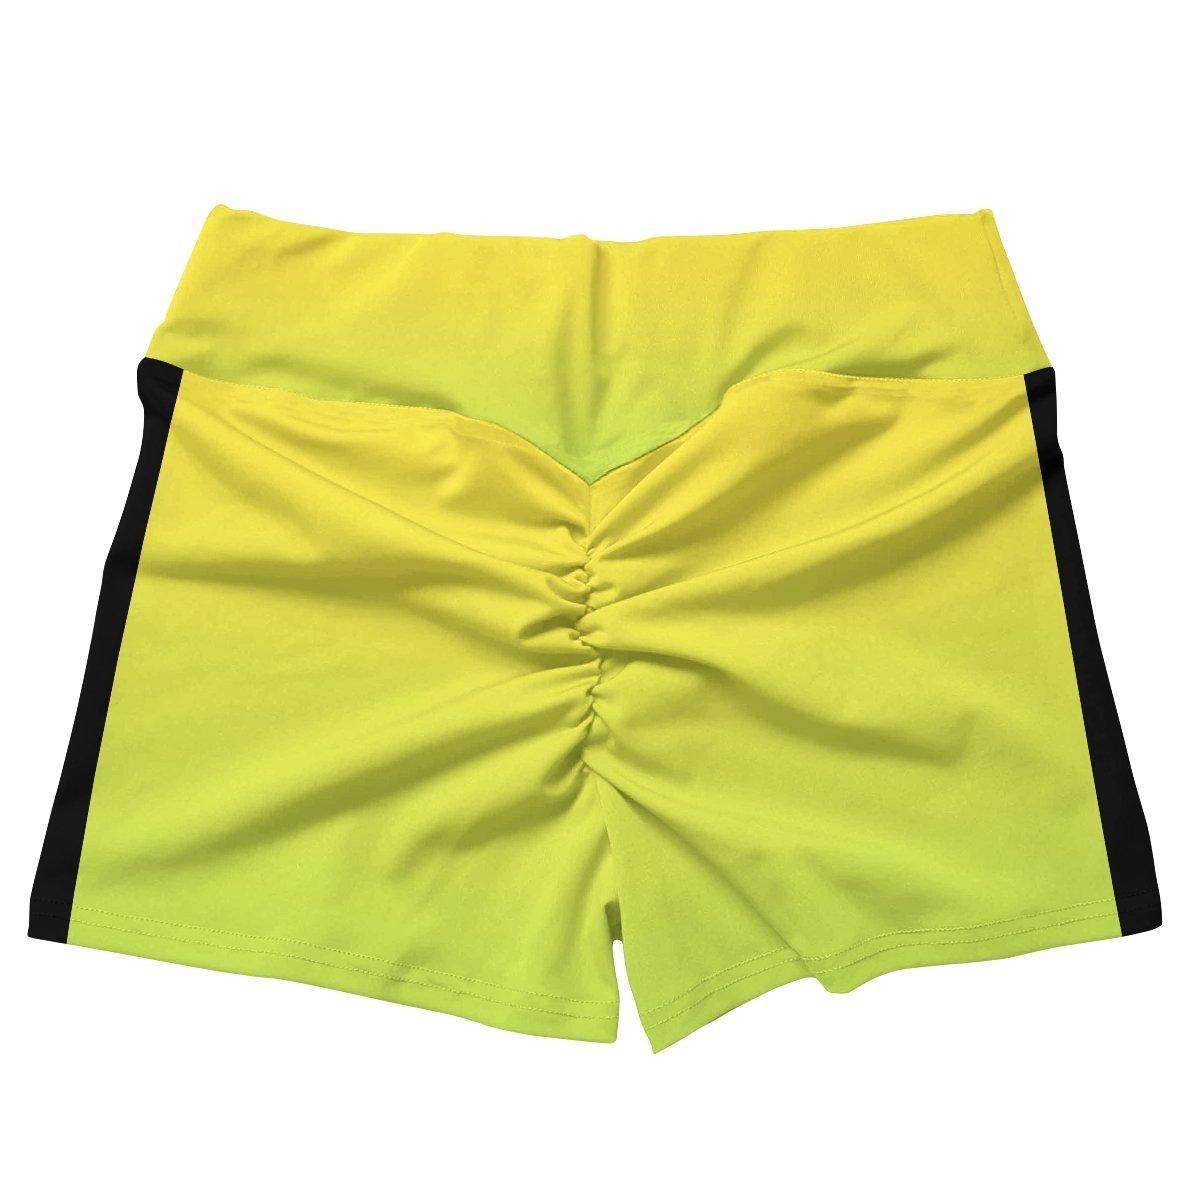 team itachiyama active wear set 483431 - Anime Swimsuits